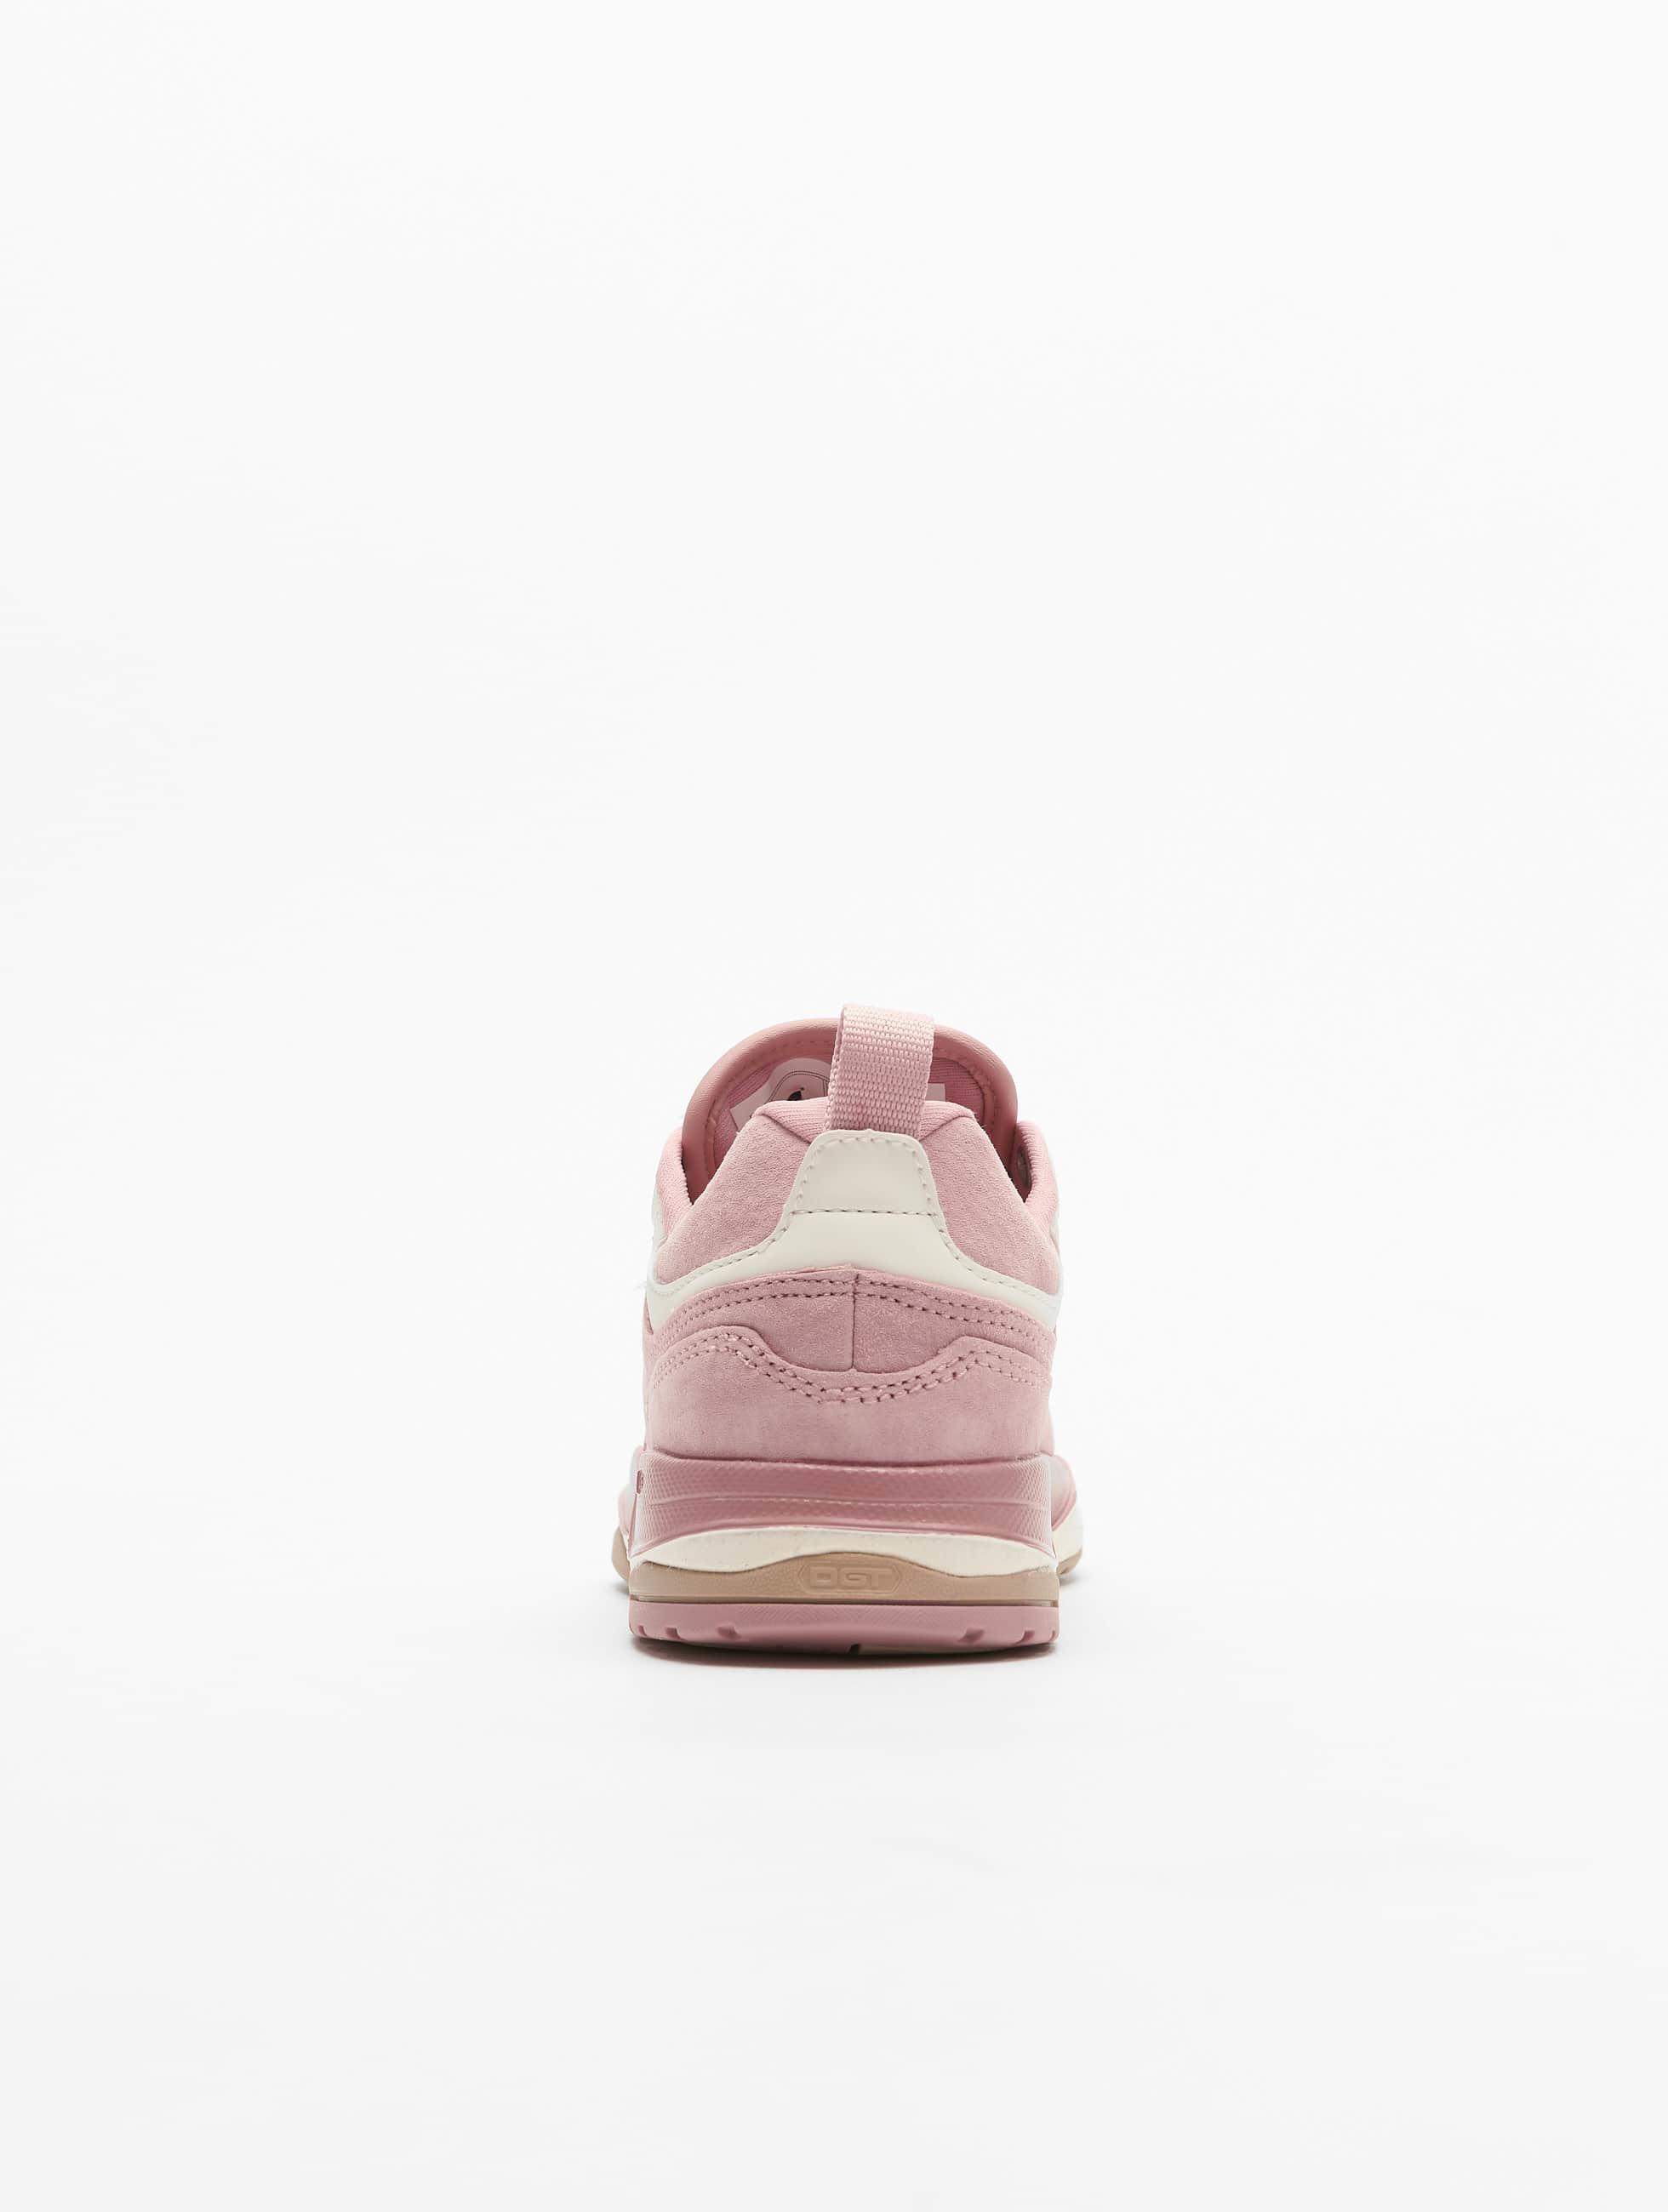 DC Damen Damen Damen Schuhe   Turnschuhe E. Tribeka Se 233e7a